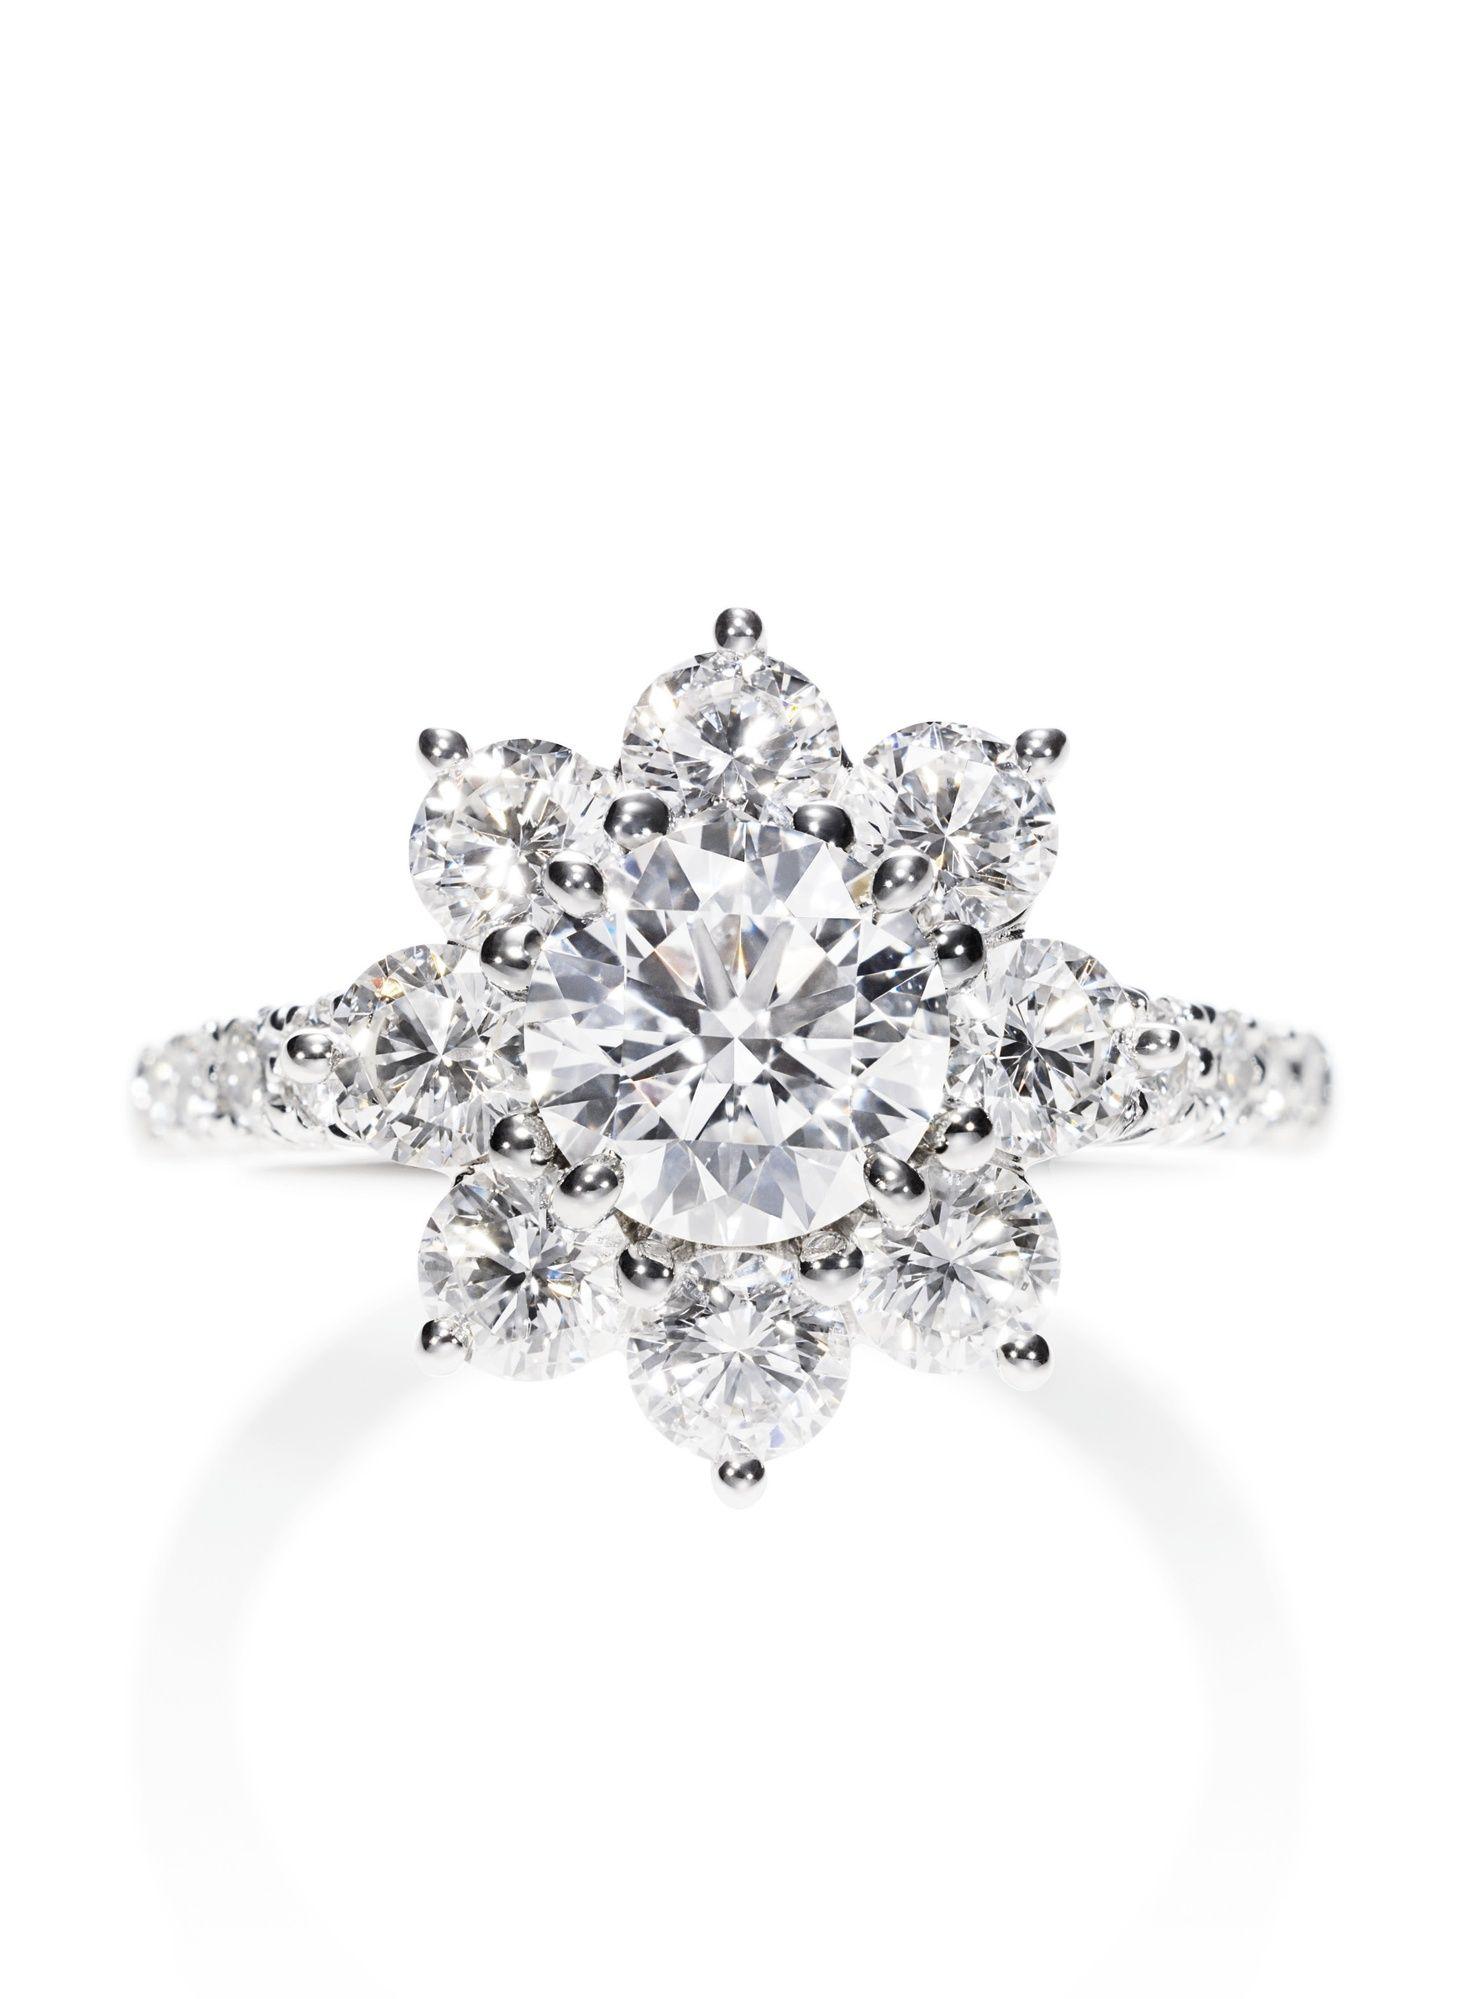 Harry Winston Sunflower Diamond Ring Sunflower ring, Diamond